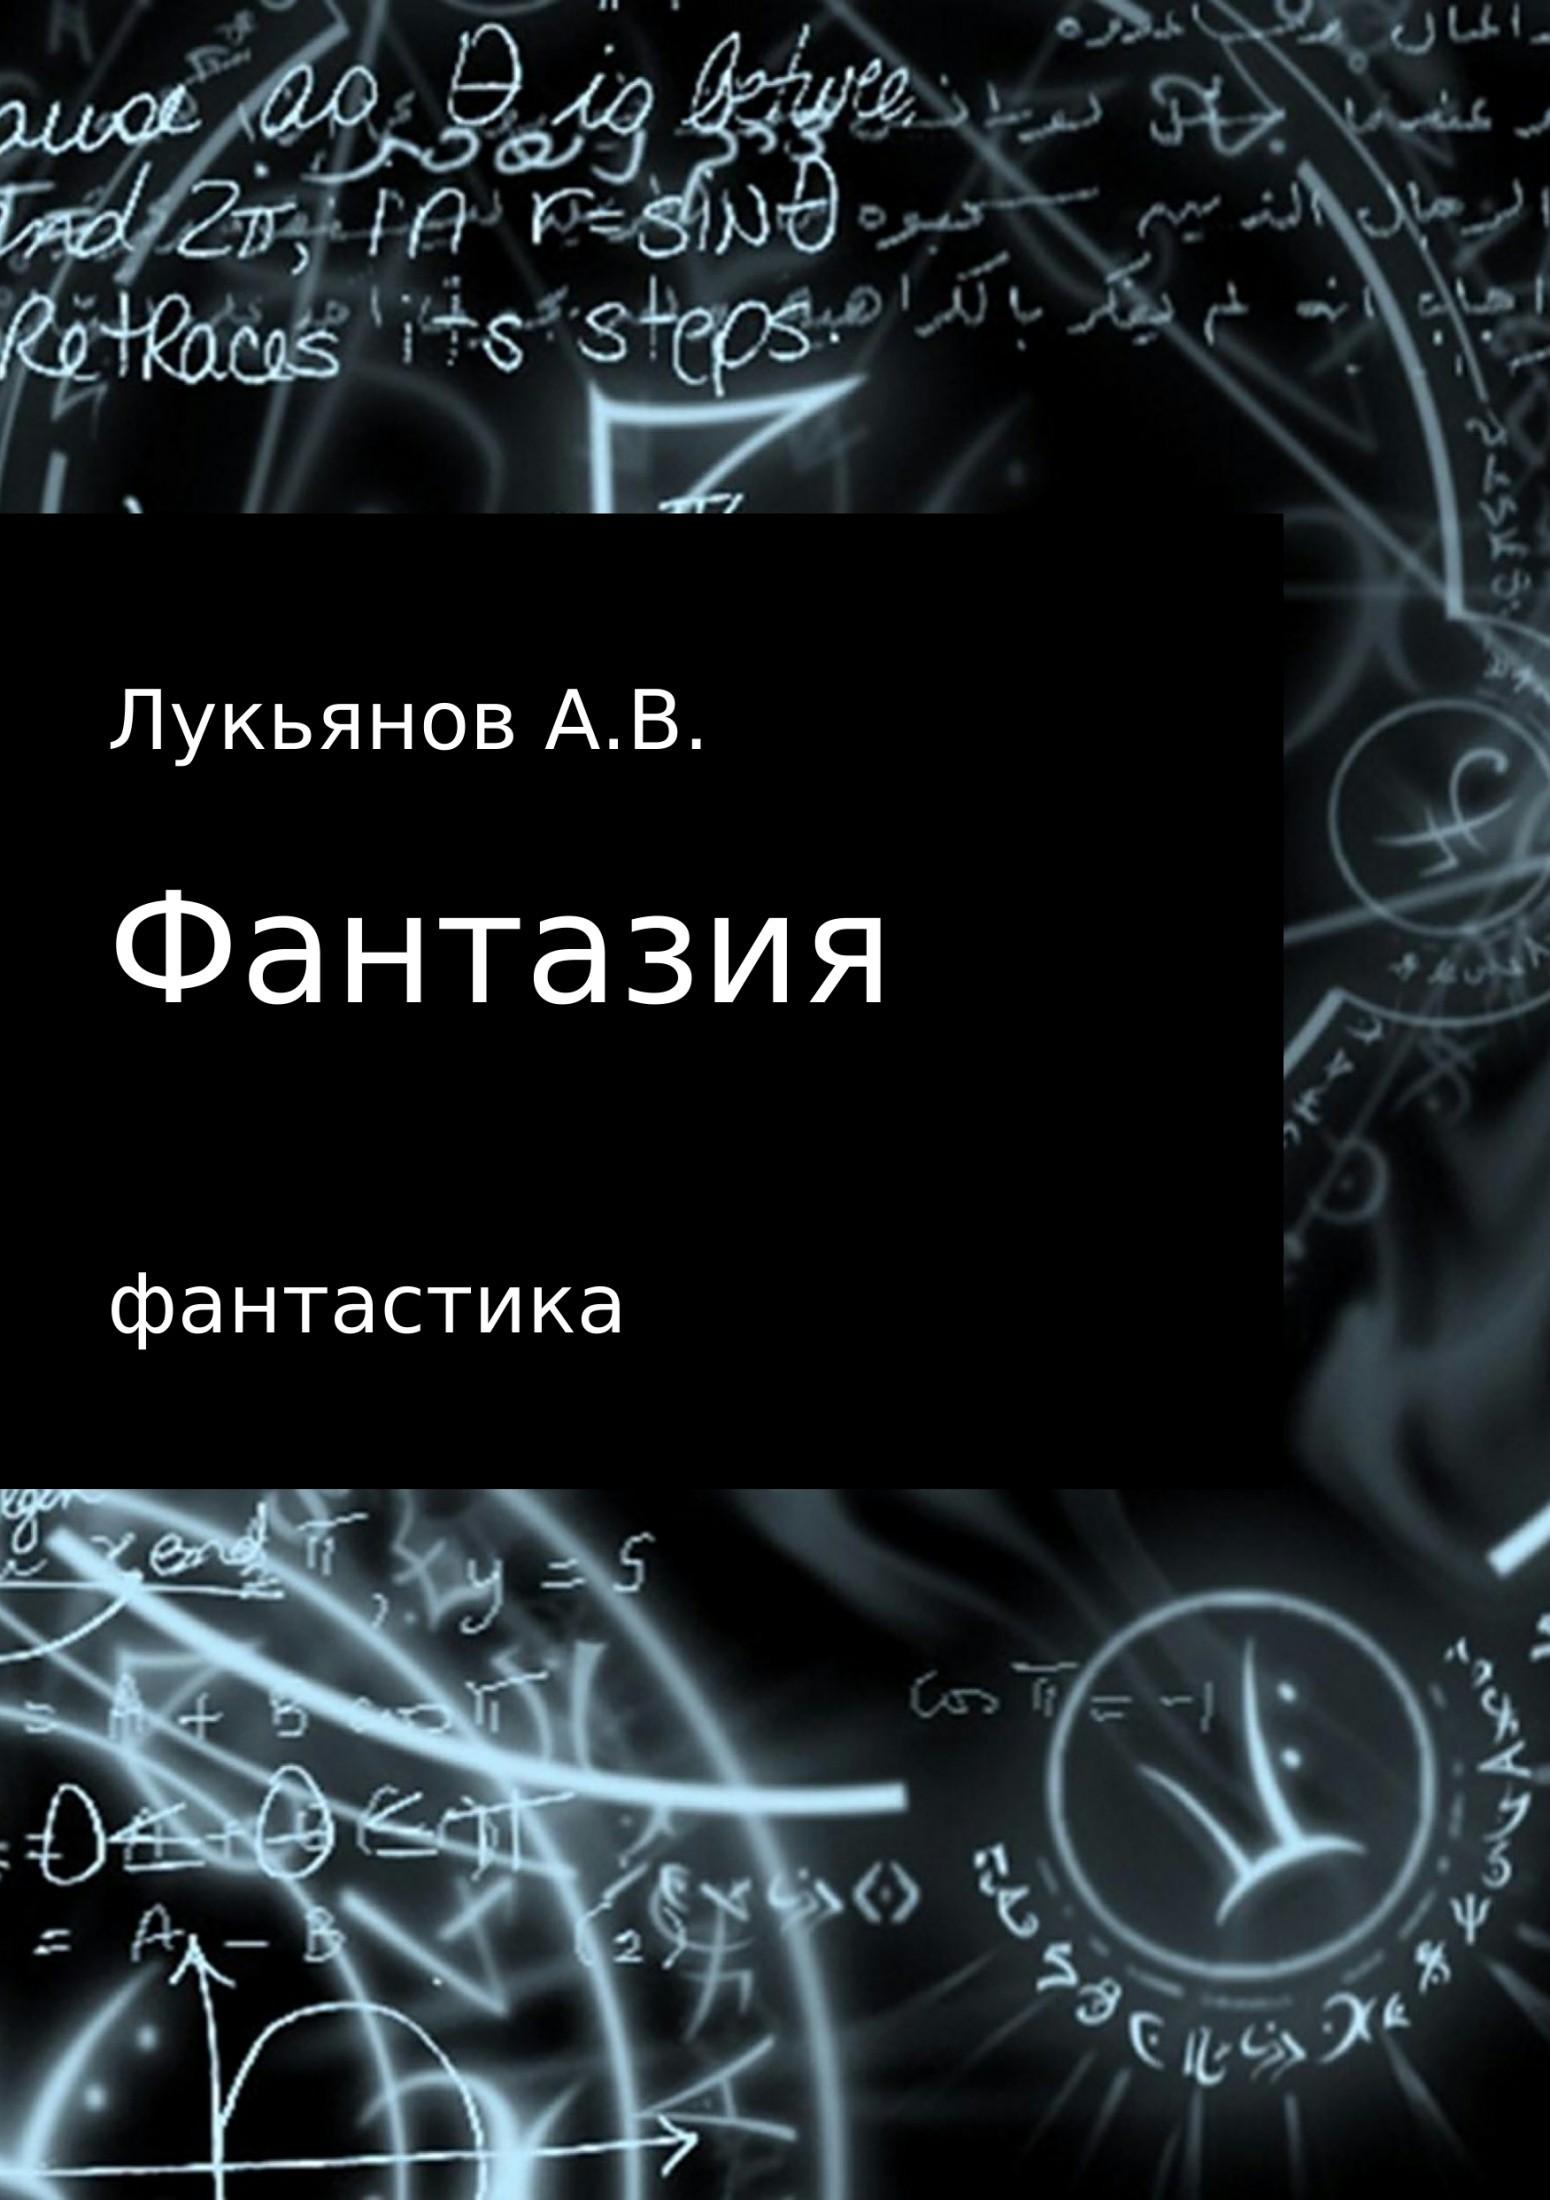 А В Лукьянов Фантазия